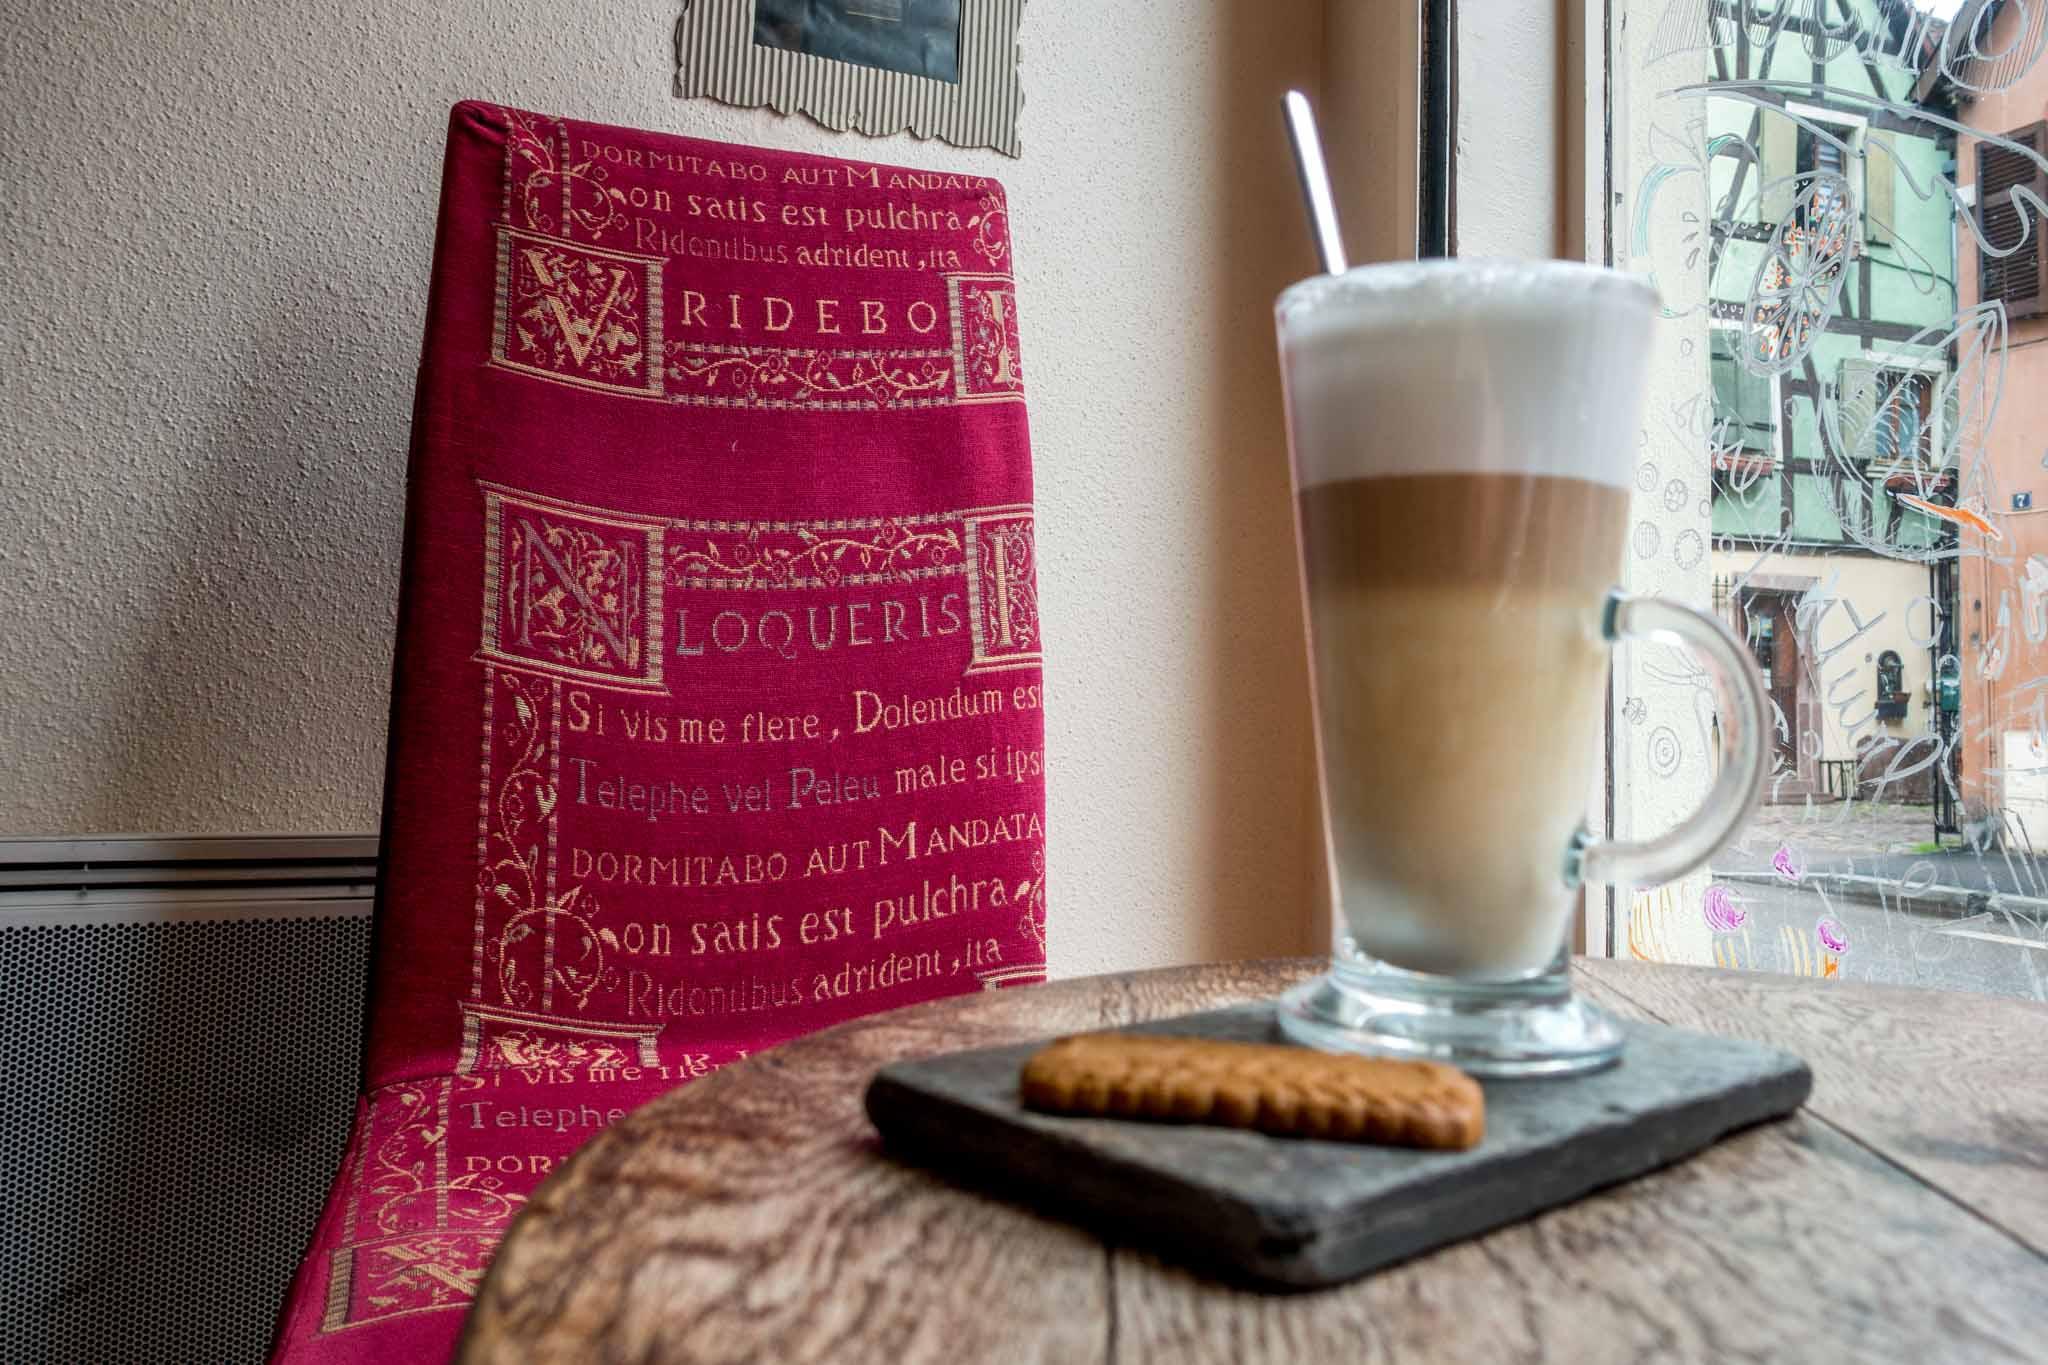 Mug of coffee and cookie